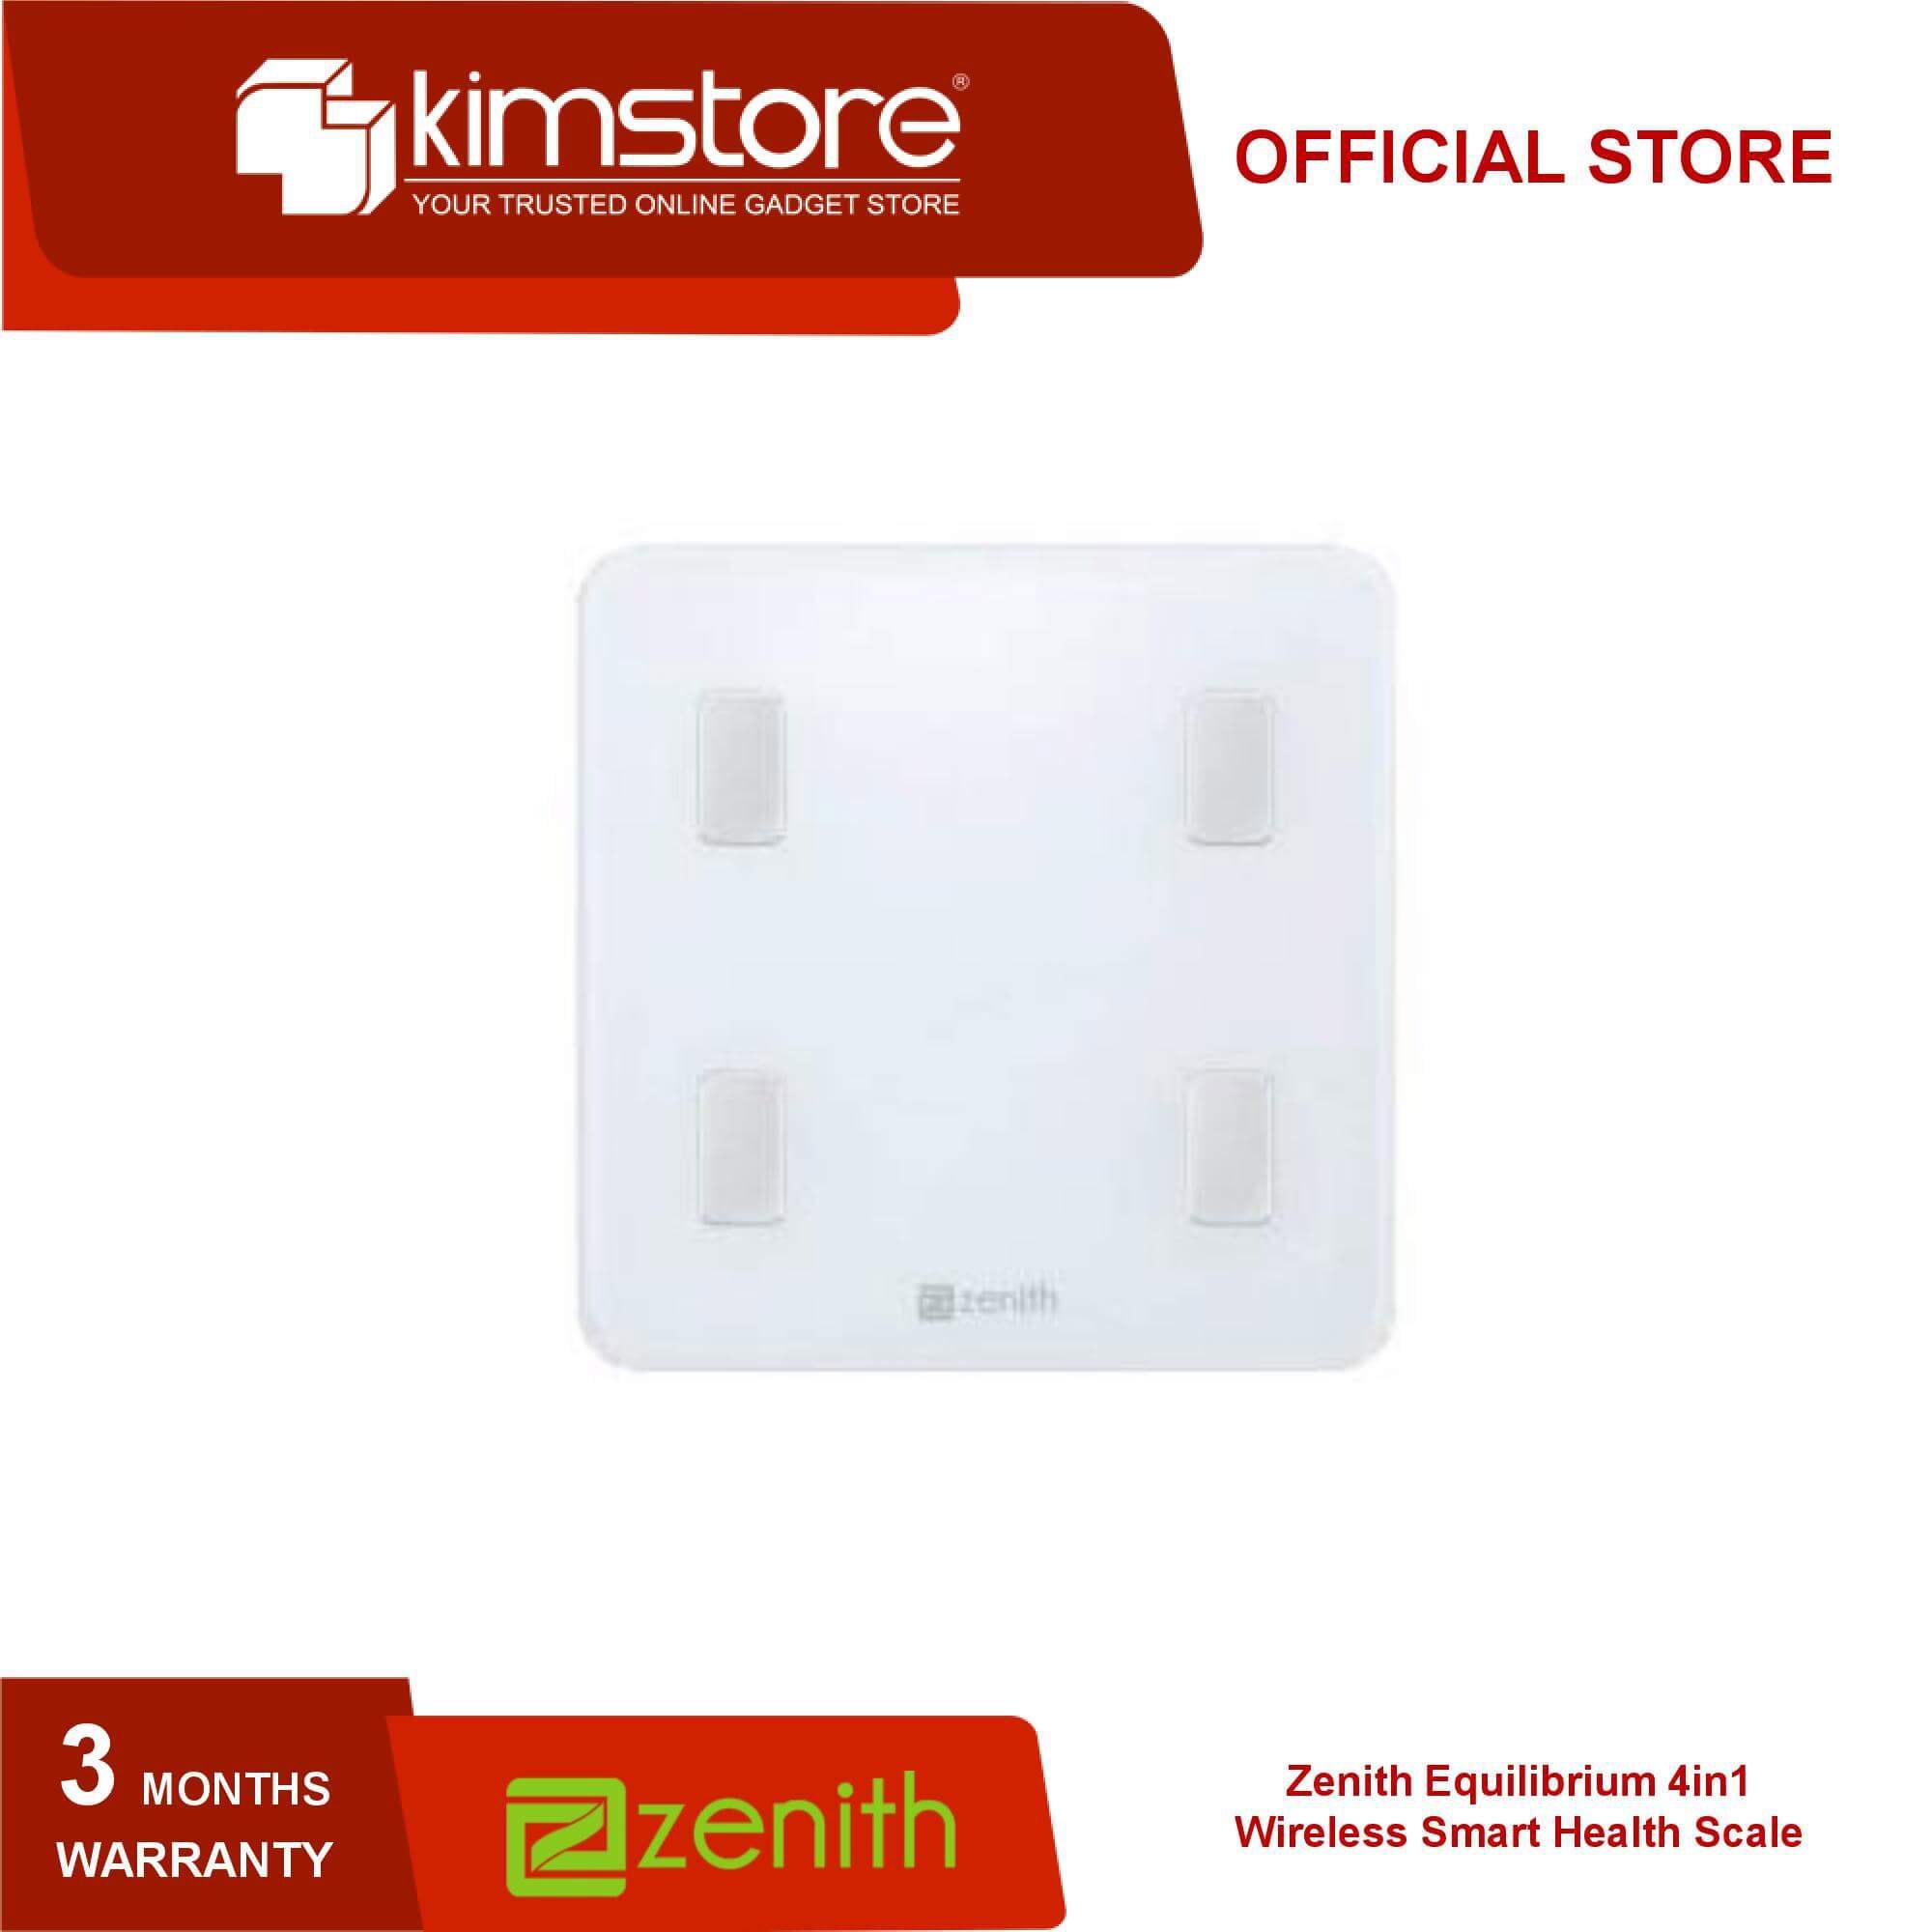 Zenith Equilibrium 4in1 Wireless Smart Health Scale